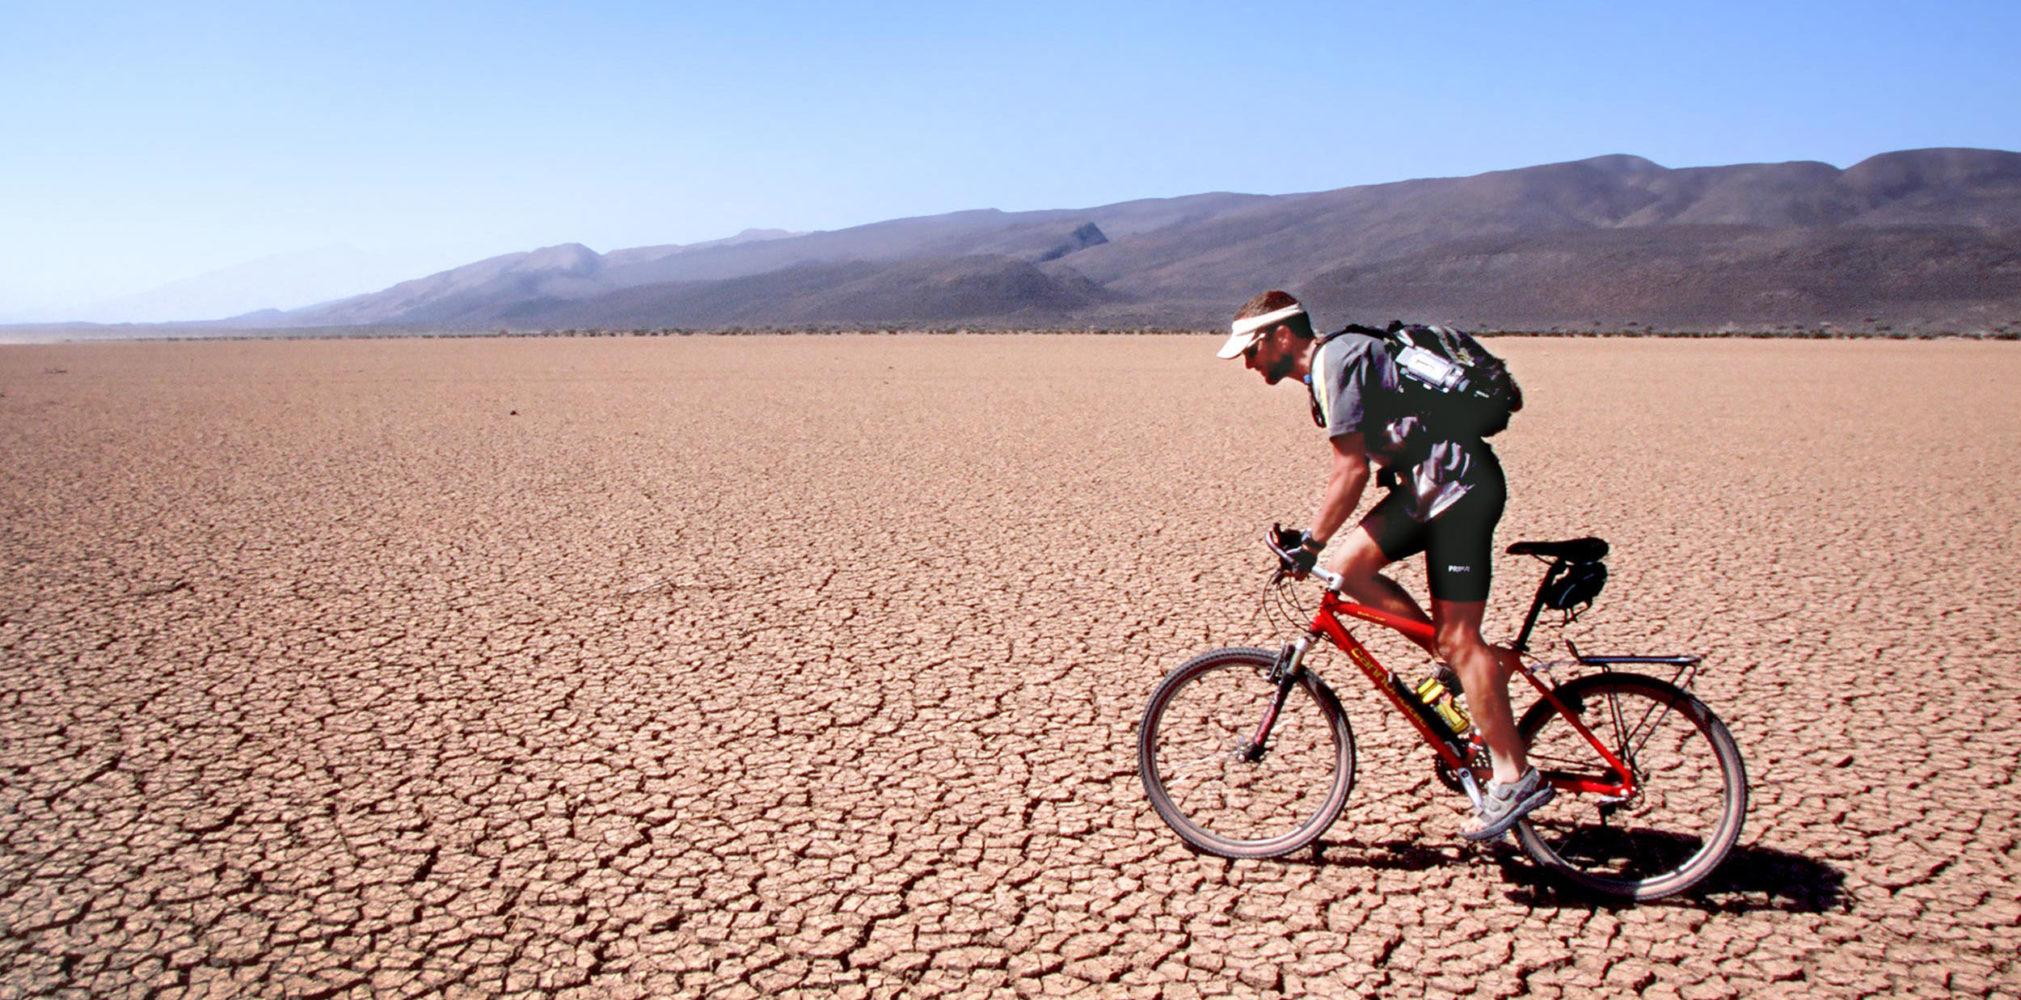 Pedal Power: Adventurer Jason Lewis